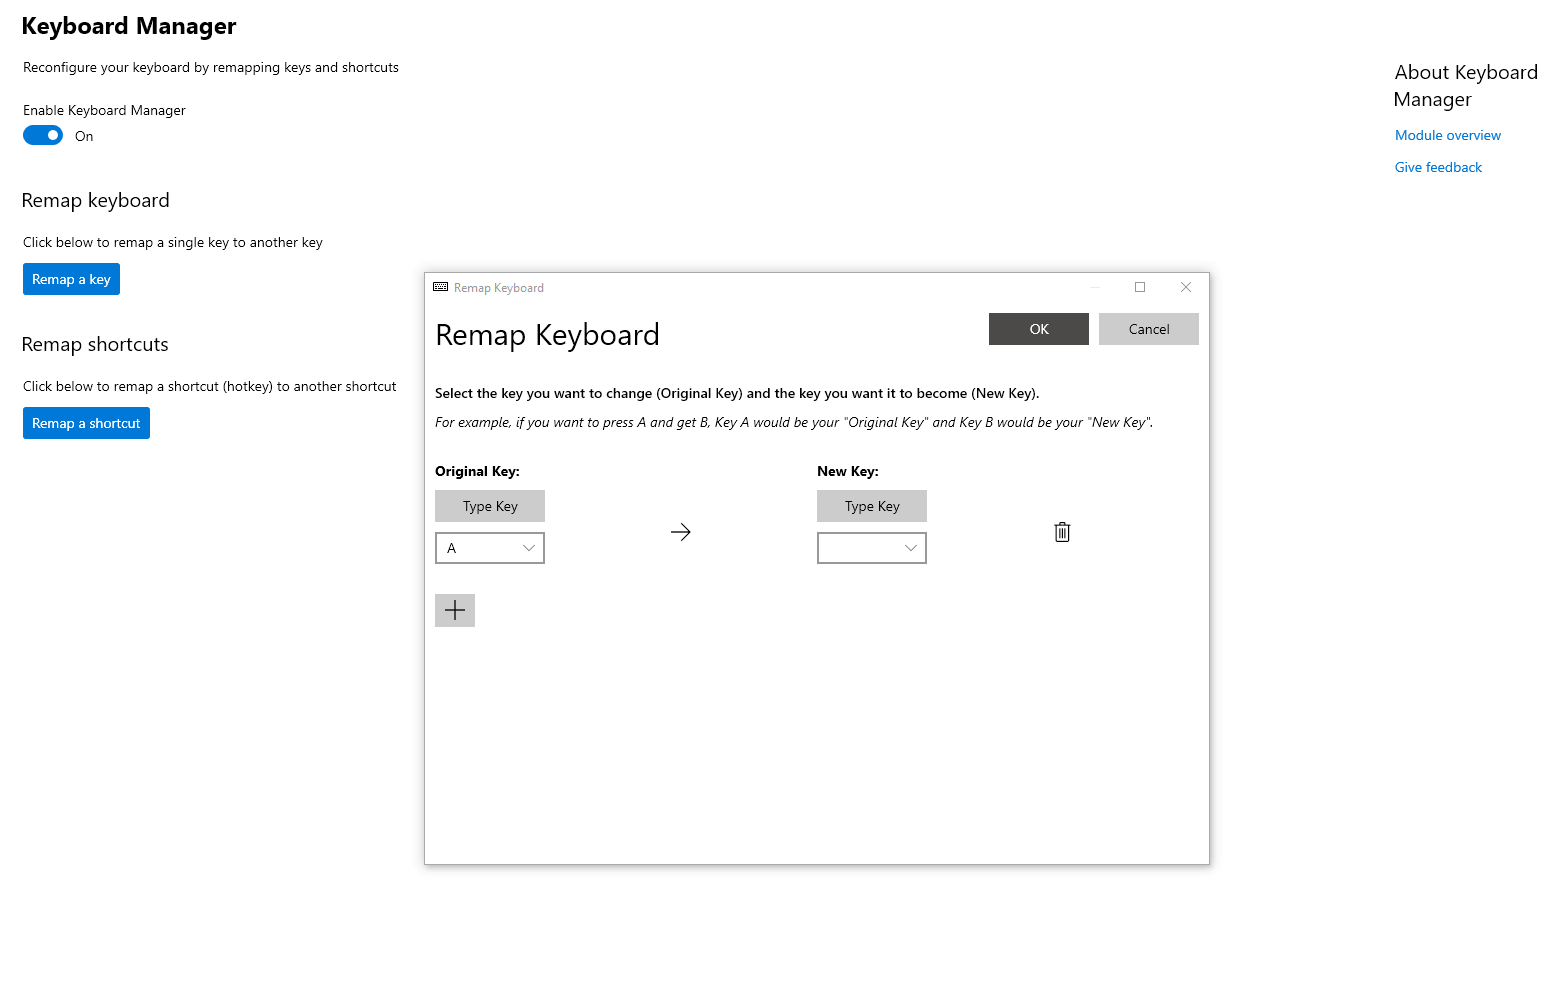 20200522.Microsoft-PowerToys-get-a-revamped-Run-launcher-02.png